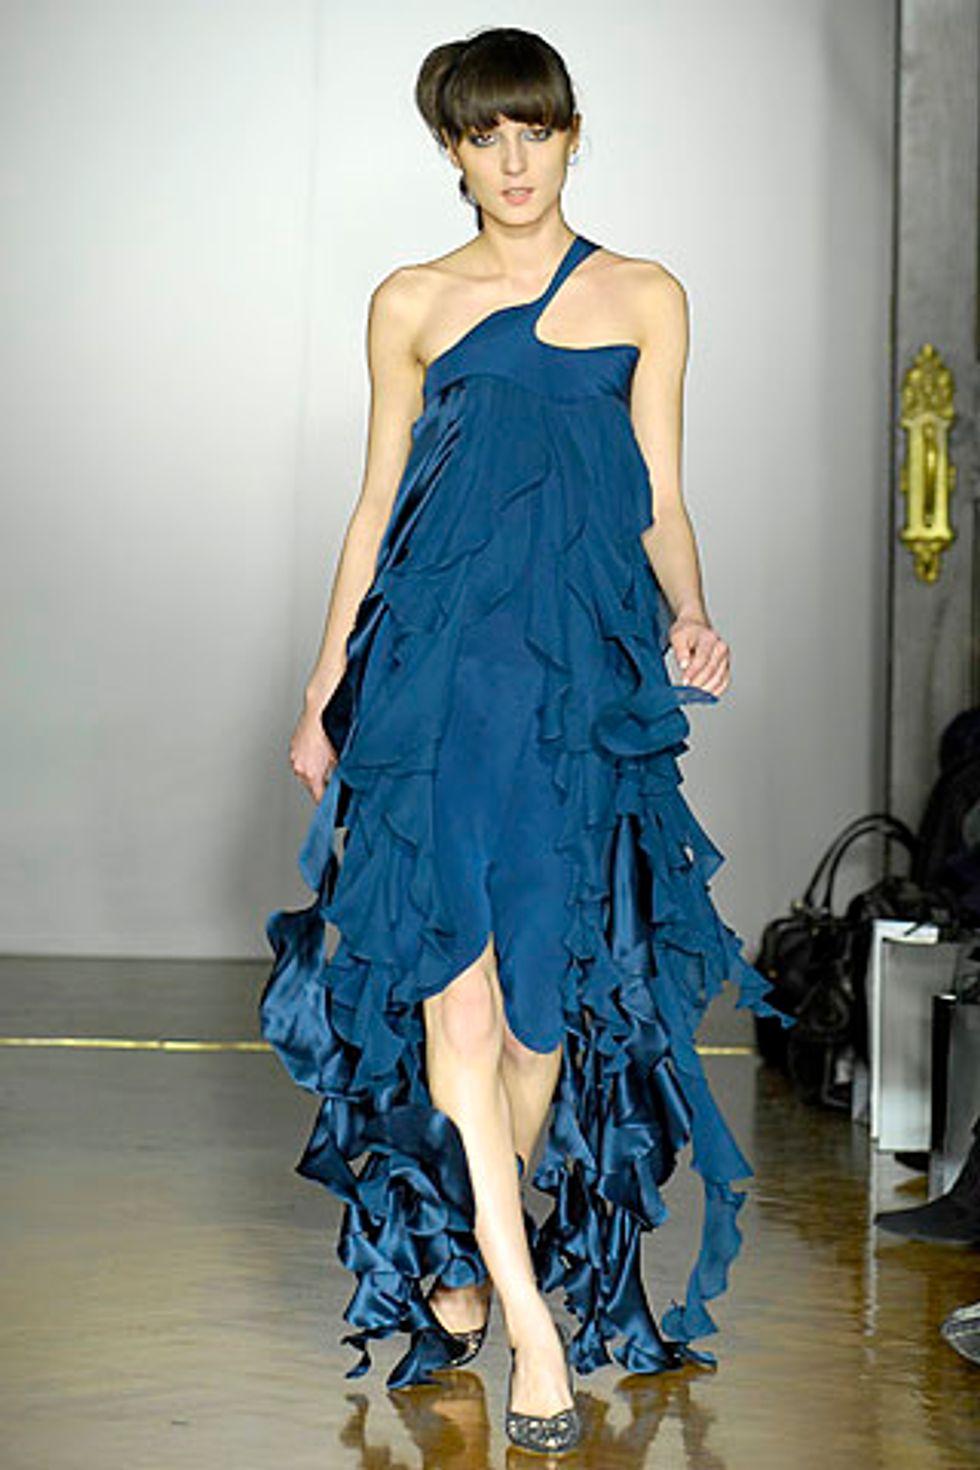 Threeasfour Nominated for CFDA/Vogue Fashion Fund Award